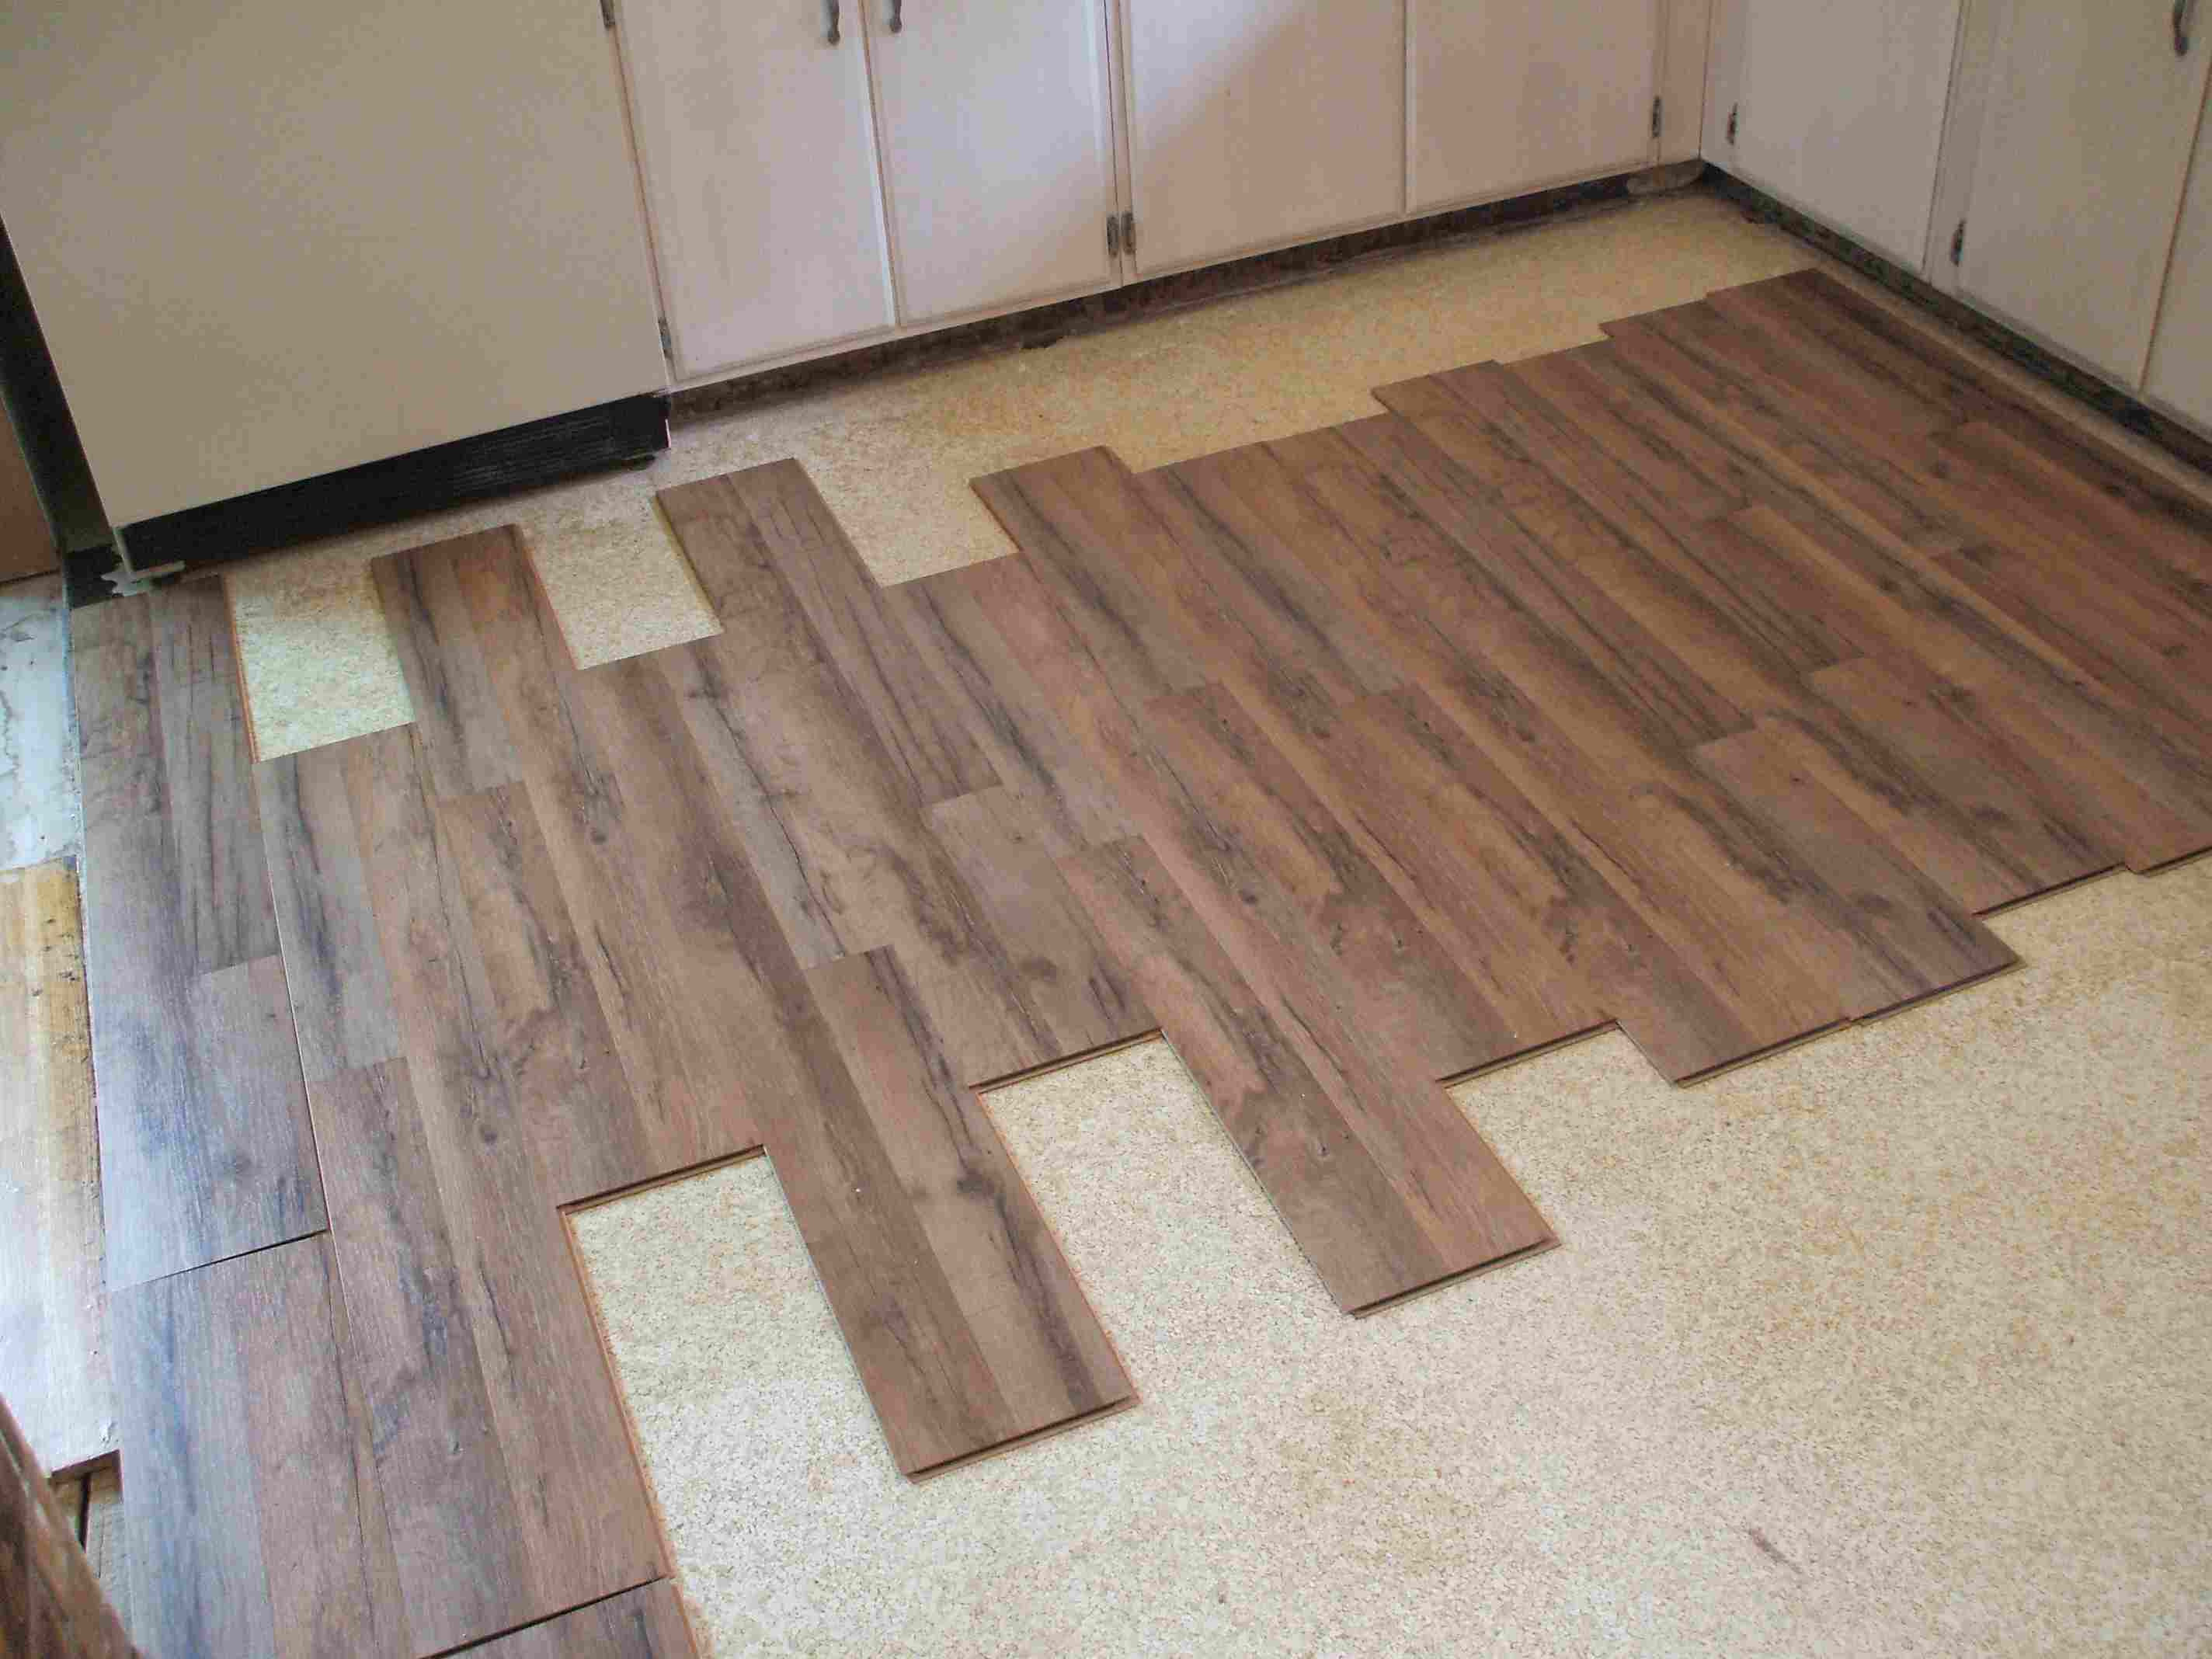 1 2 inch hardwood flooring of laminate flooring installation made easy intended for installing laminate eyeballing layout 56a49d075f9b58b7d0d7d693 jpg